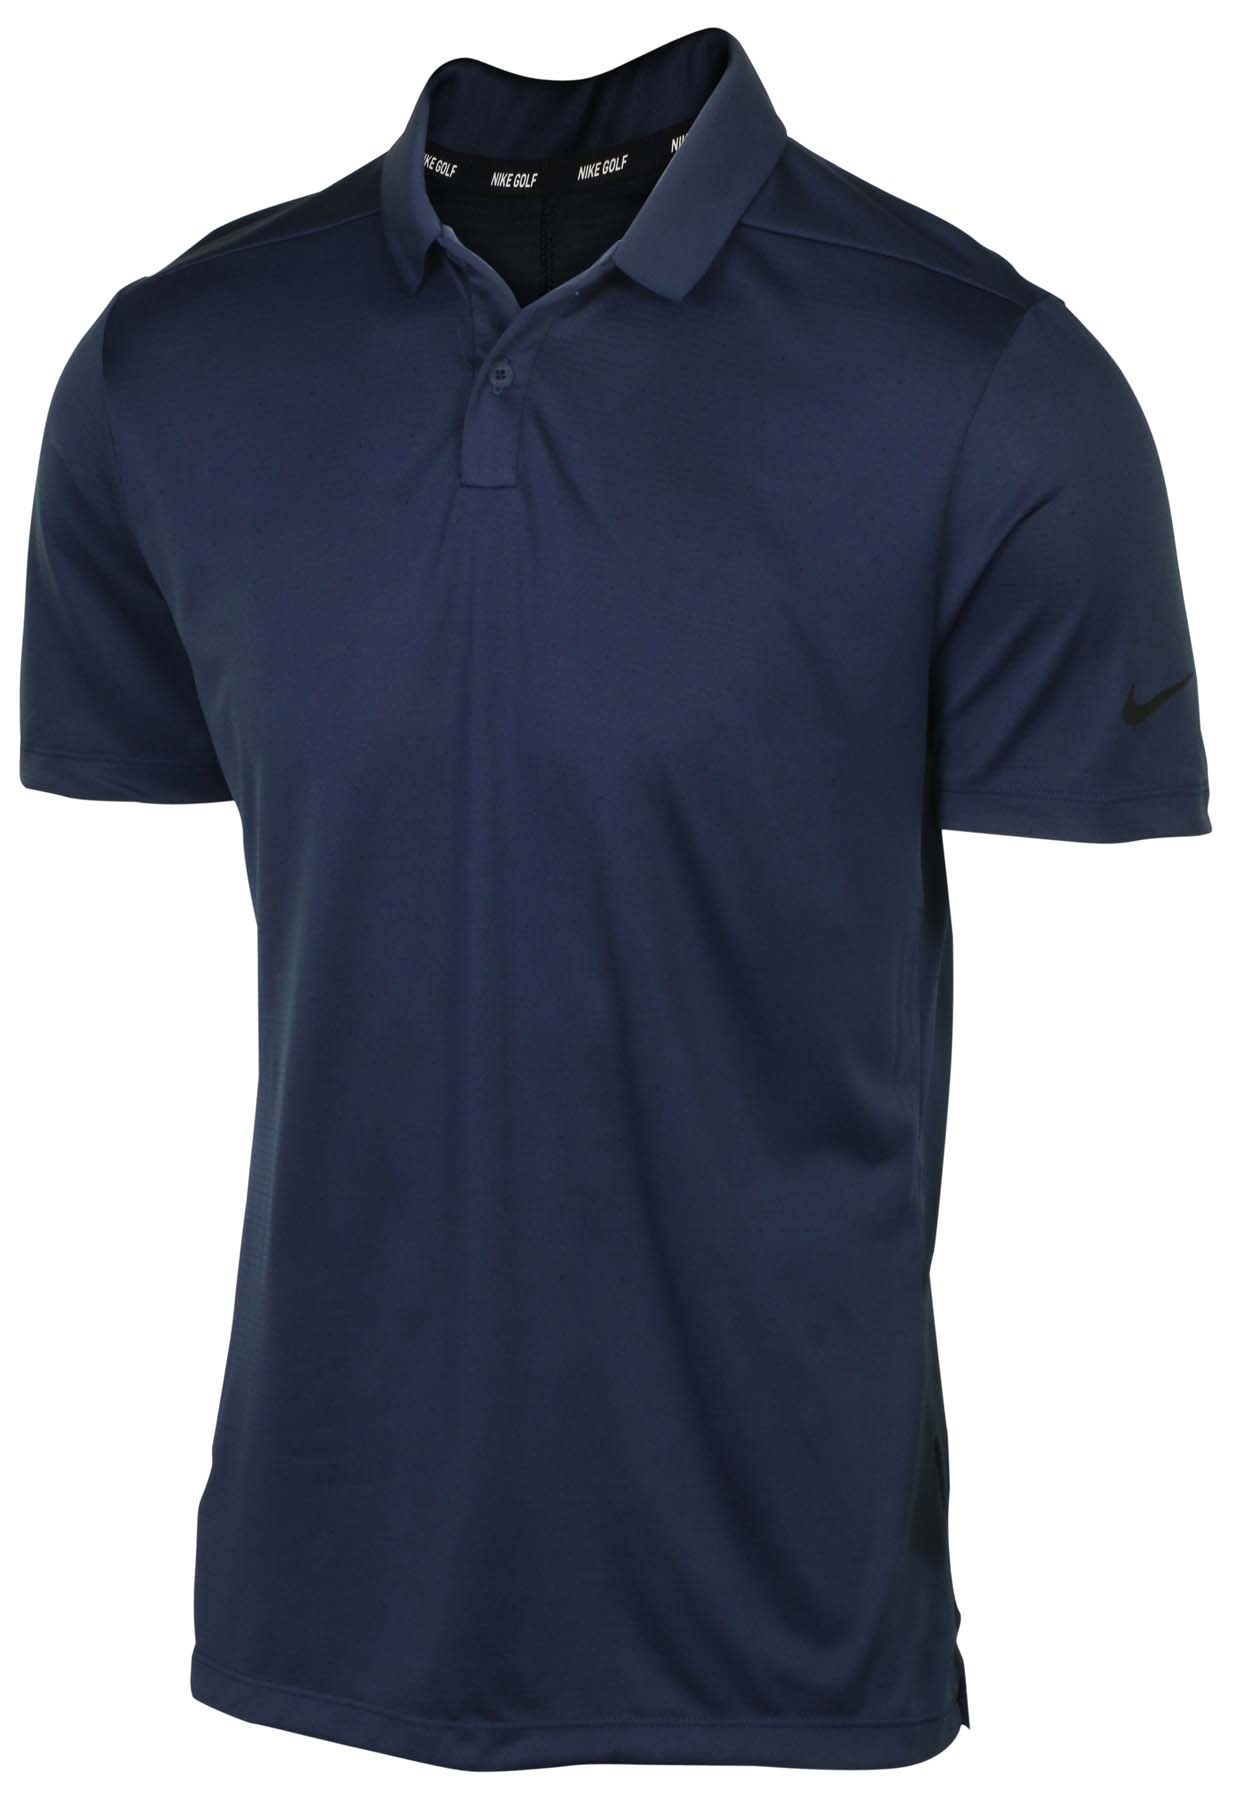 Nike Mens Dri Fit Breathe Texture Golf Polo Shirt Ebay